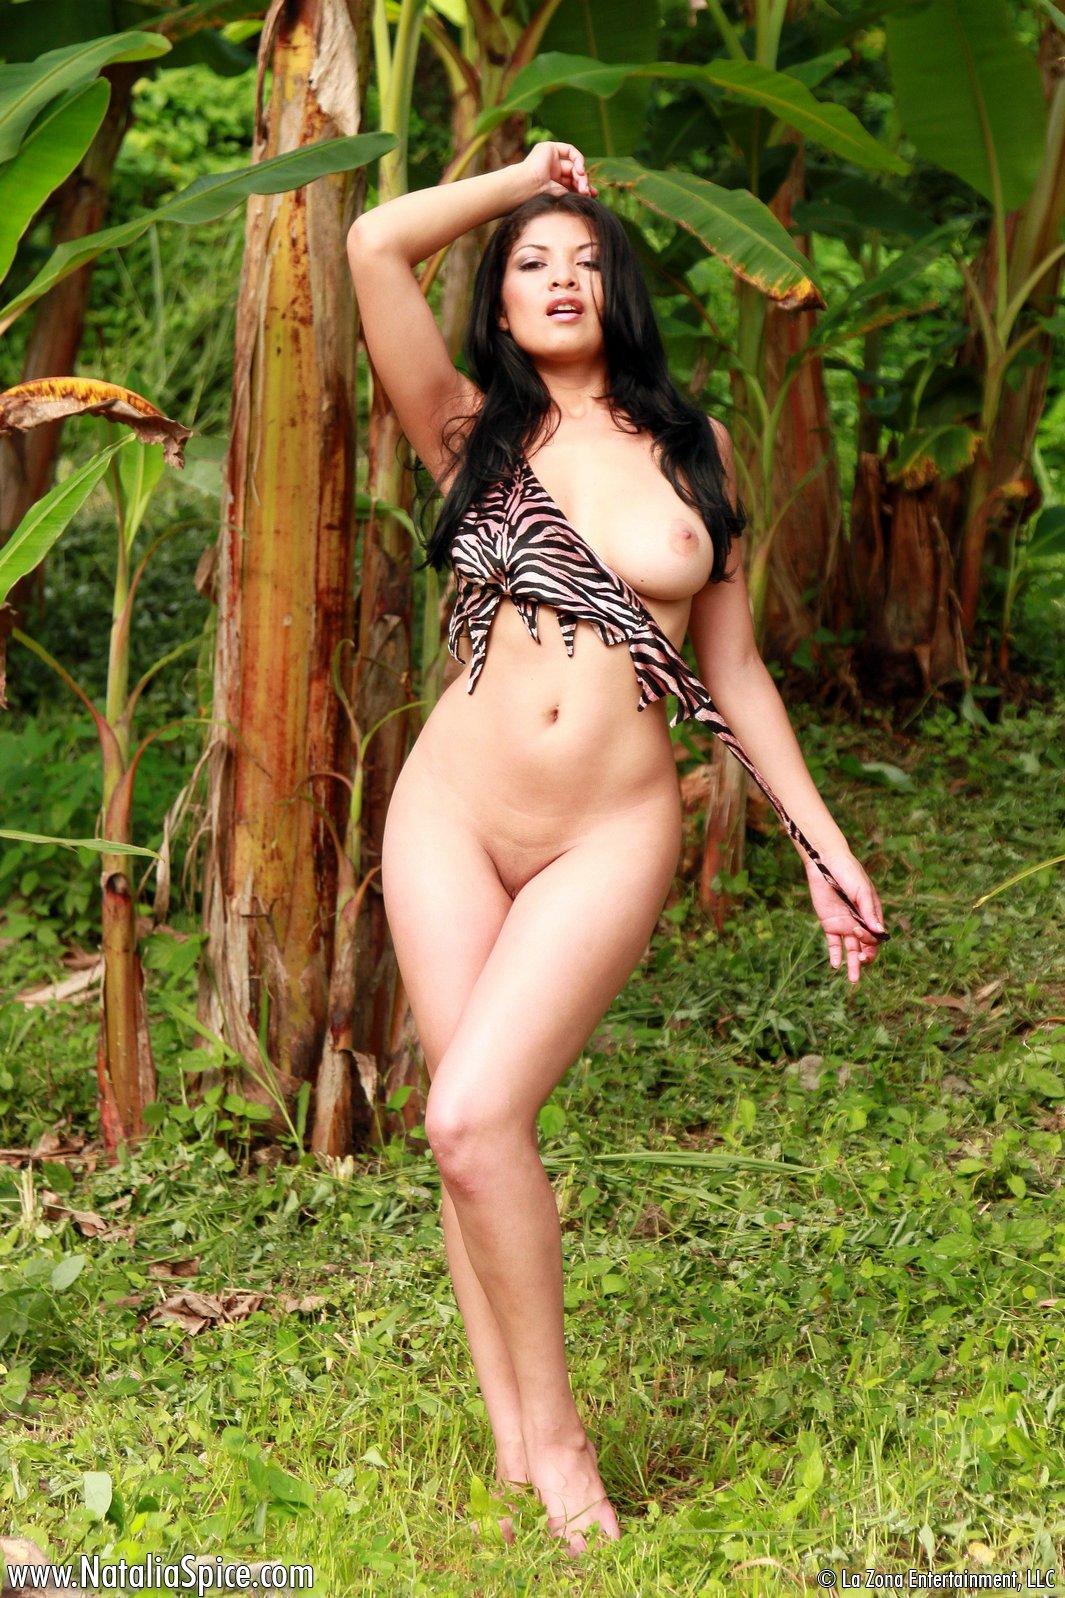 Perfect anal girl nude fuck gif